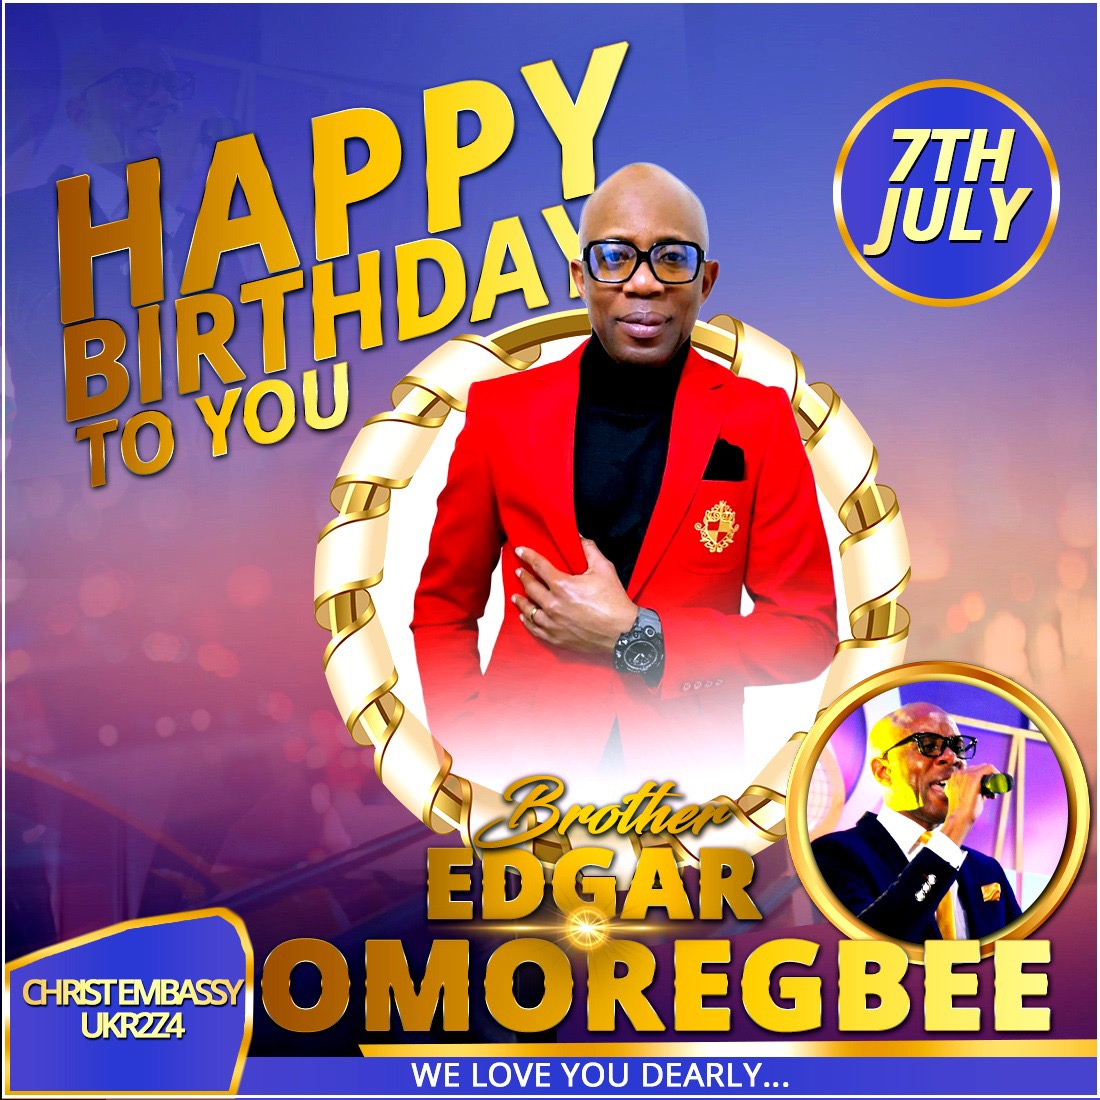 Happy Birthday Esteemed Brother Edgar!